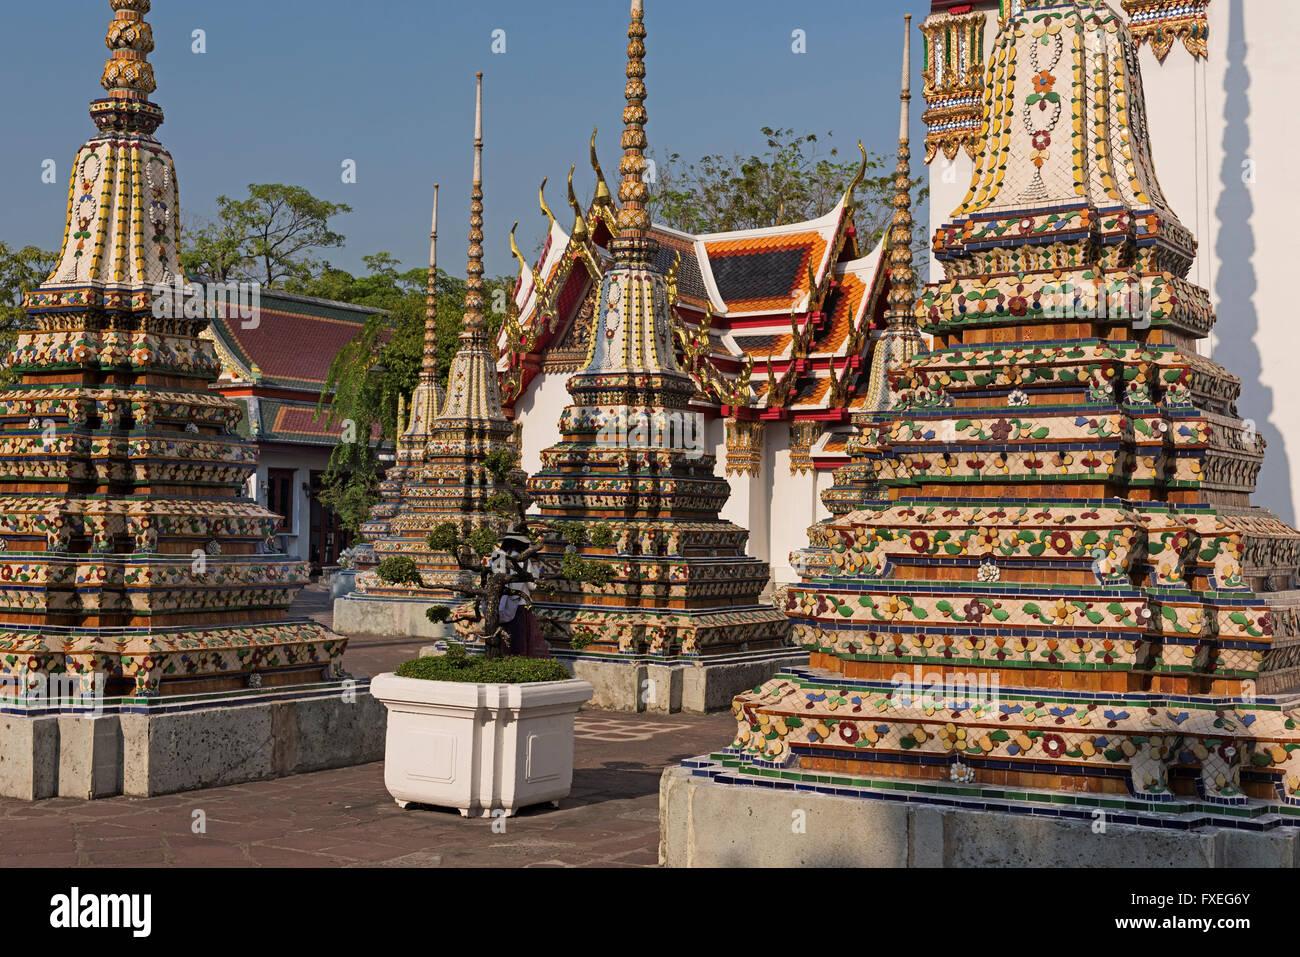 Wat Pho Bangkok Thailand Stock Photo